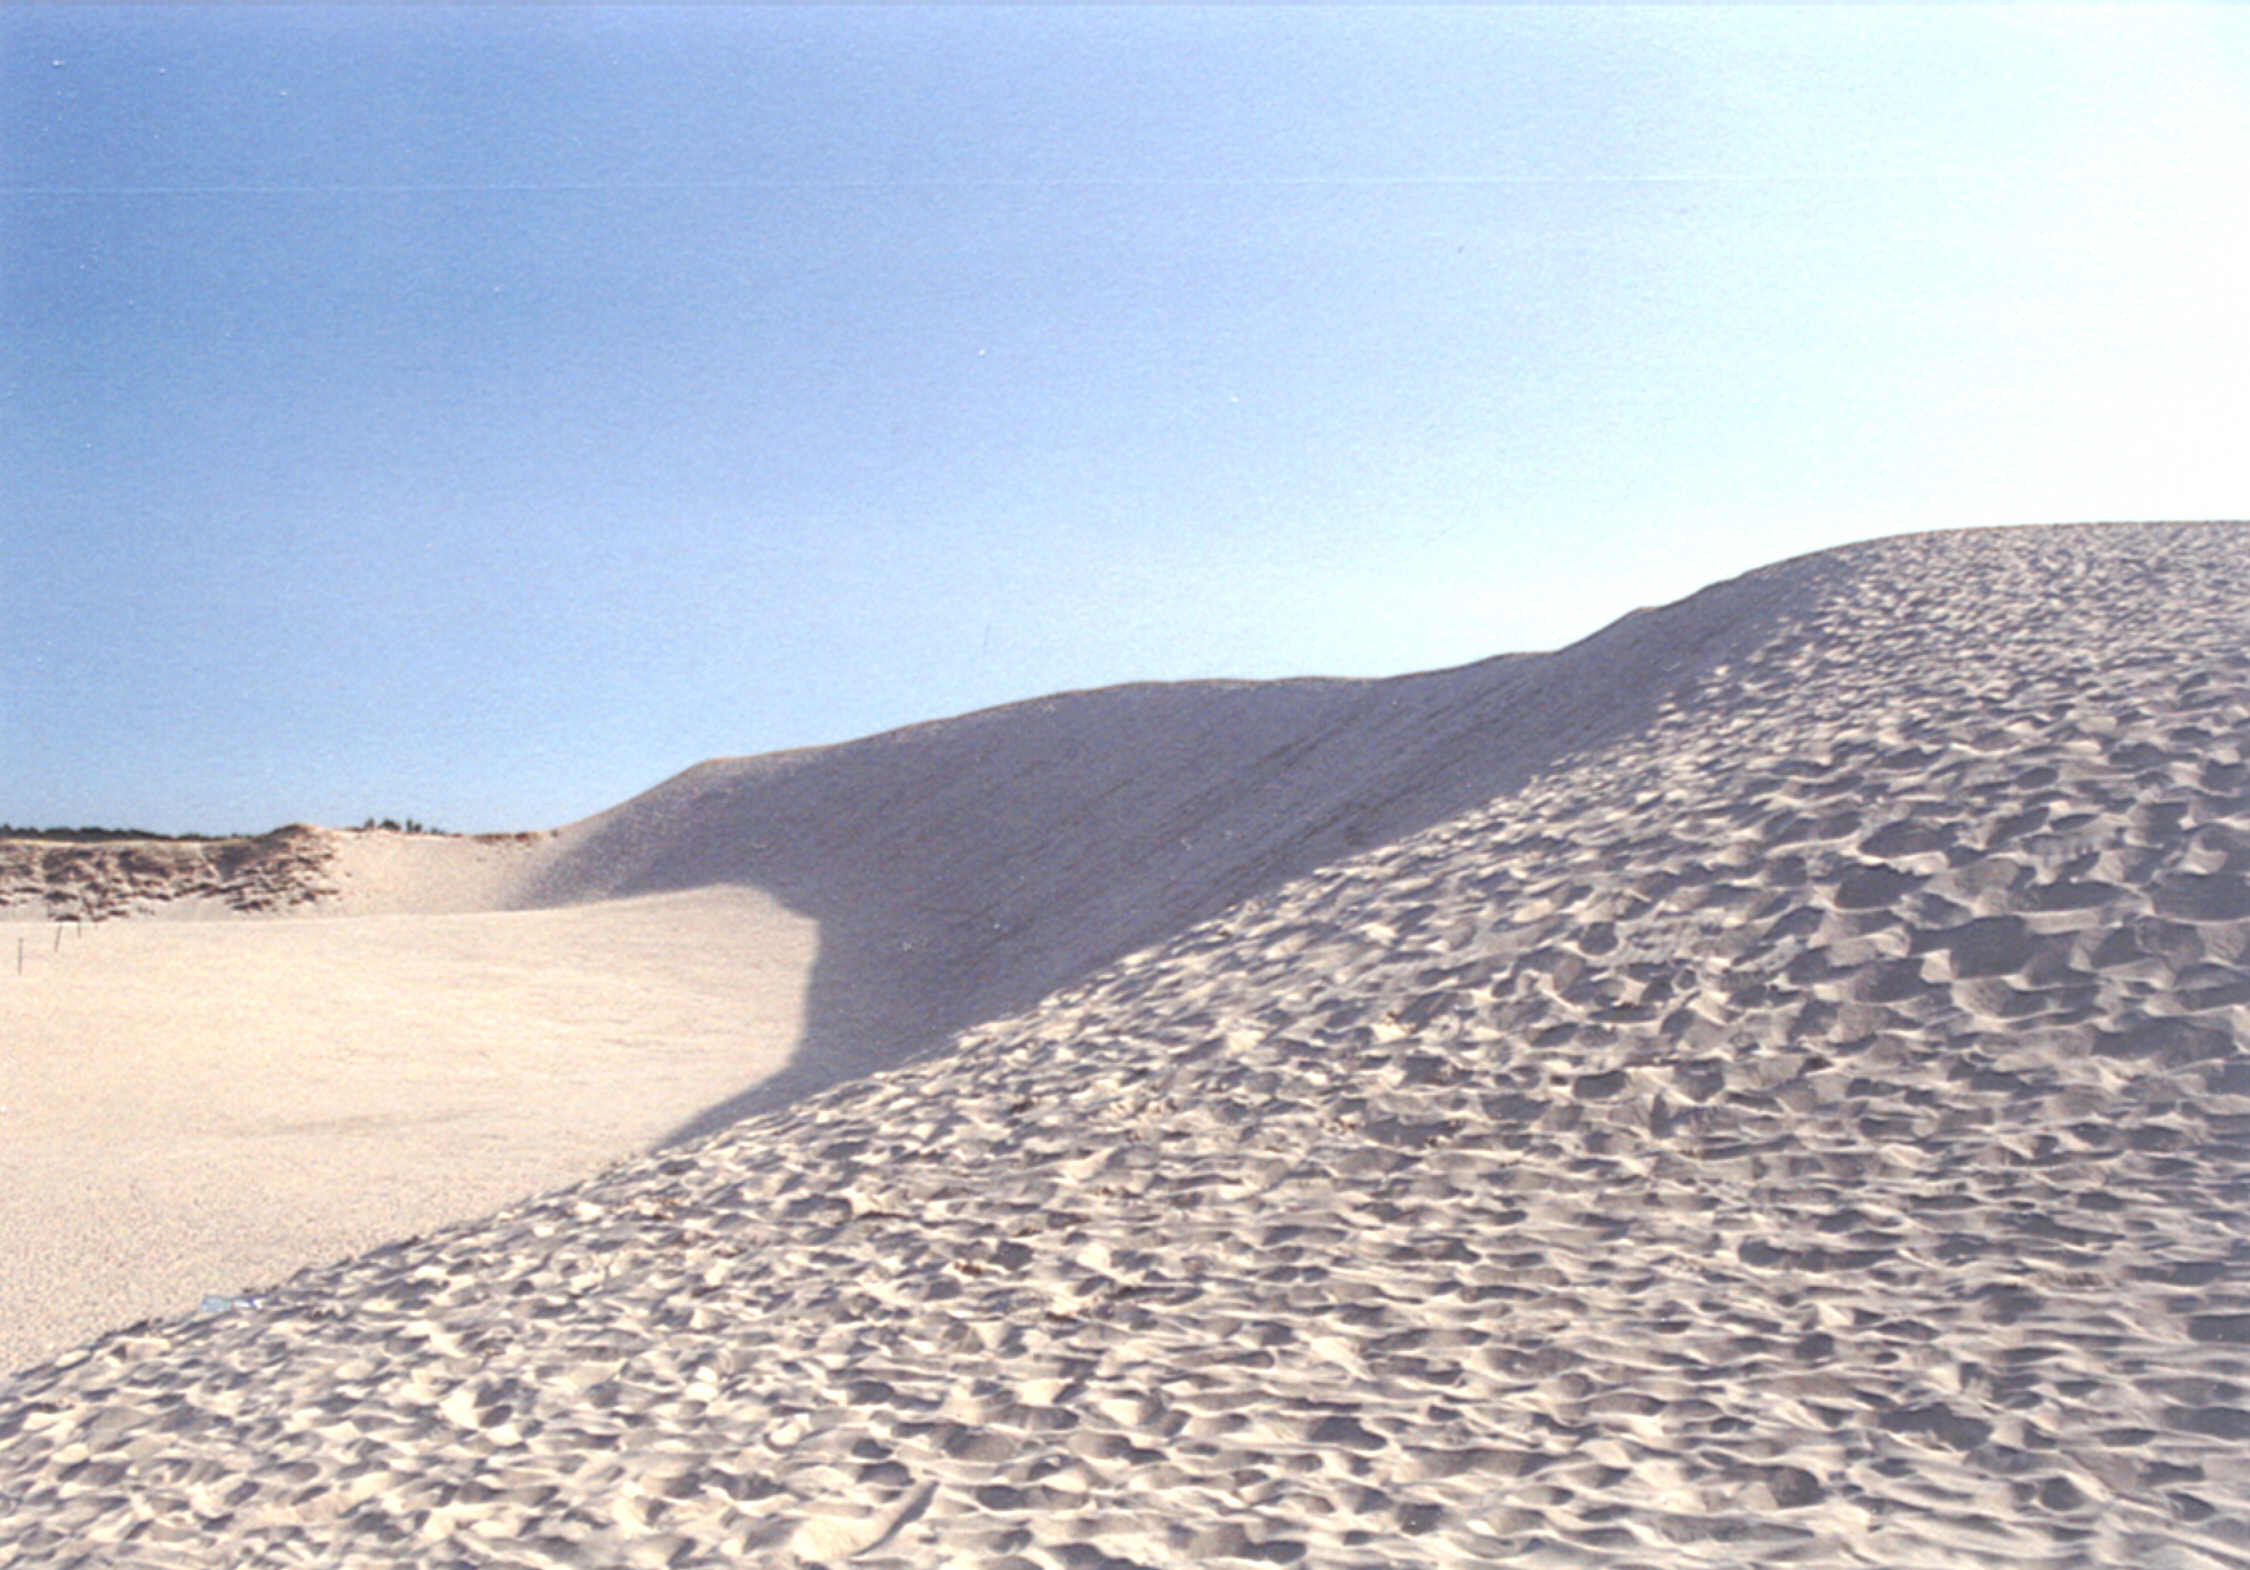 Die große Düne Laska Gora bei Leba. Foto: B.Jäger-Dabek